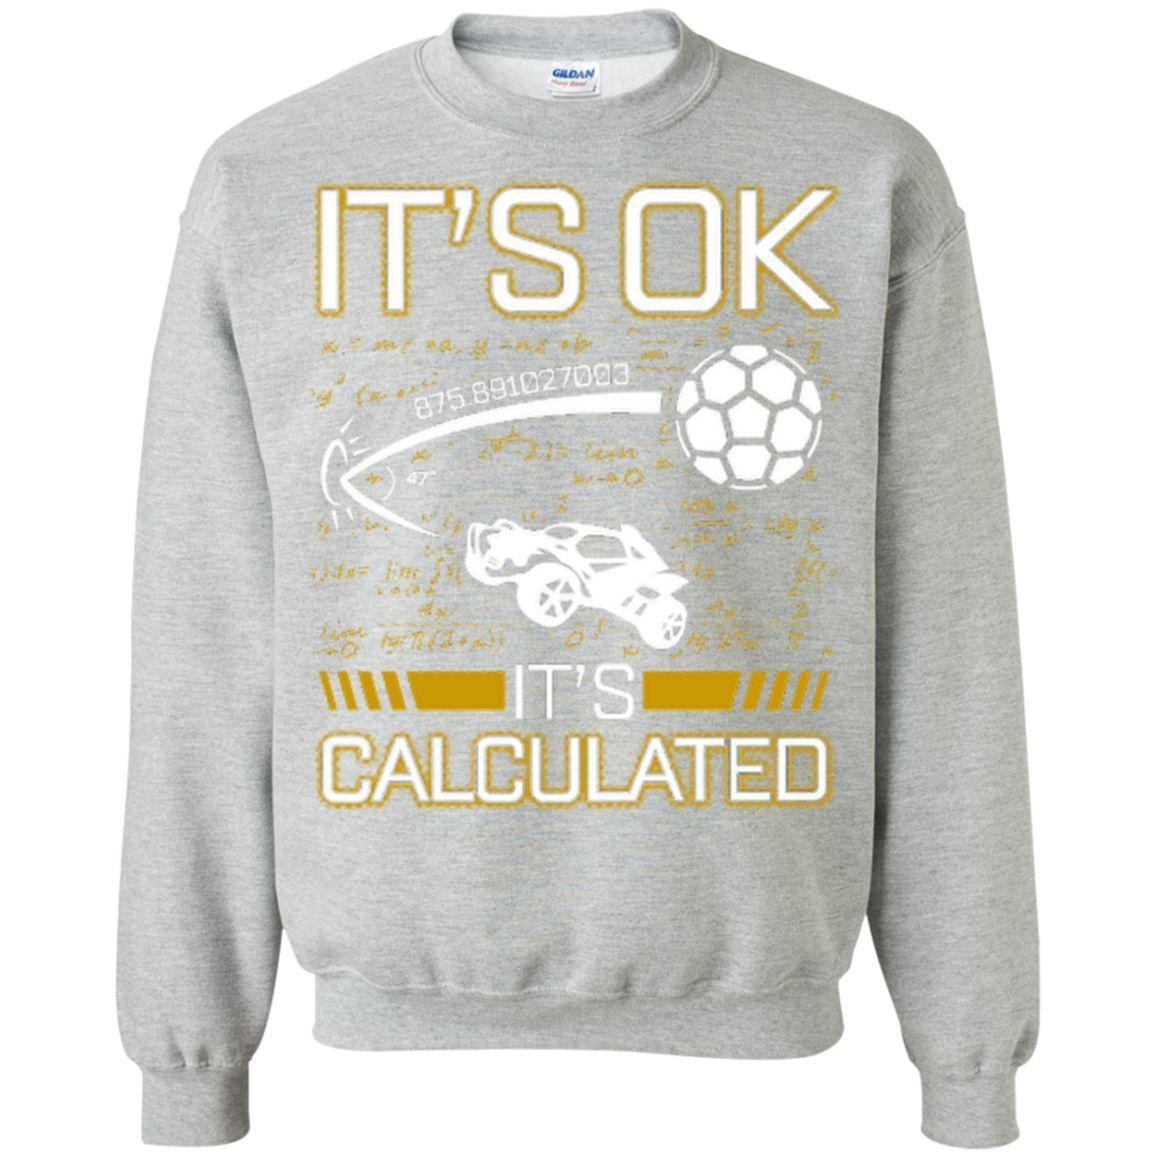 It\'s OK It\'s Calculated - Printed Crewneck Pullover Sweatshirt 8 oz